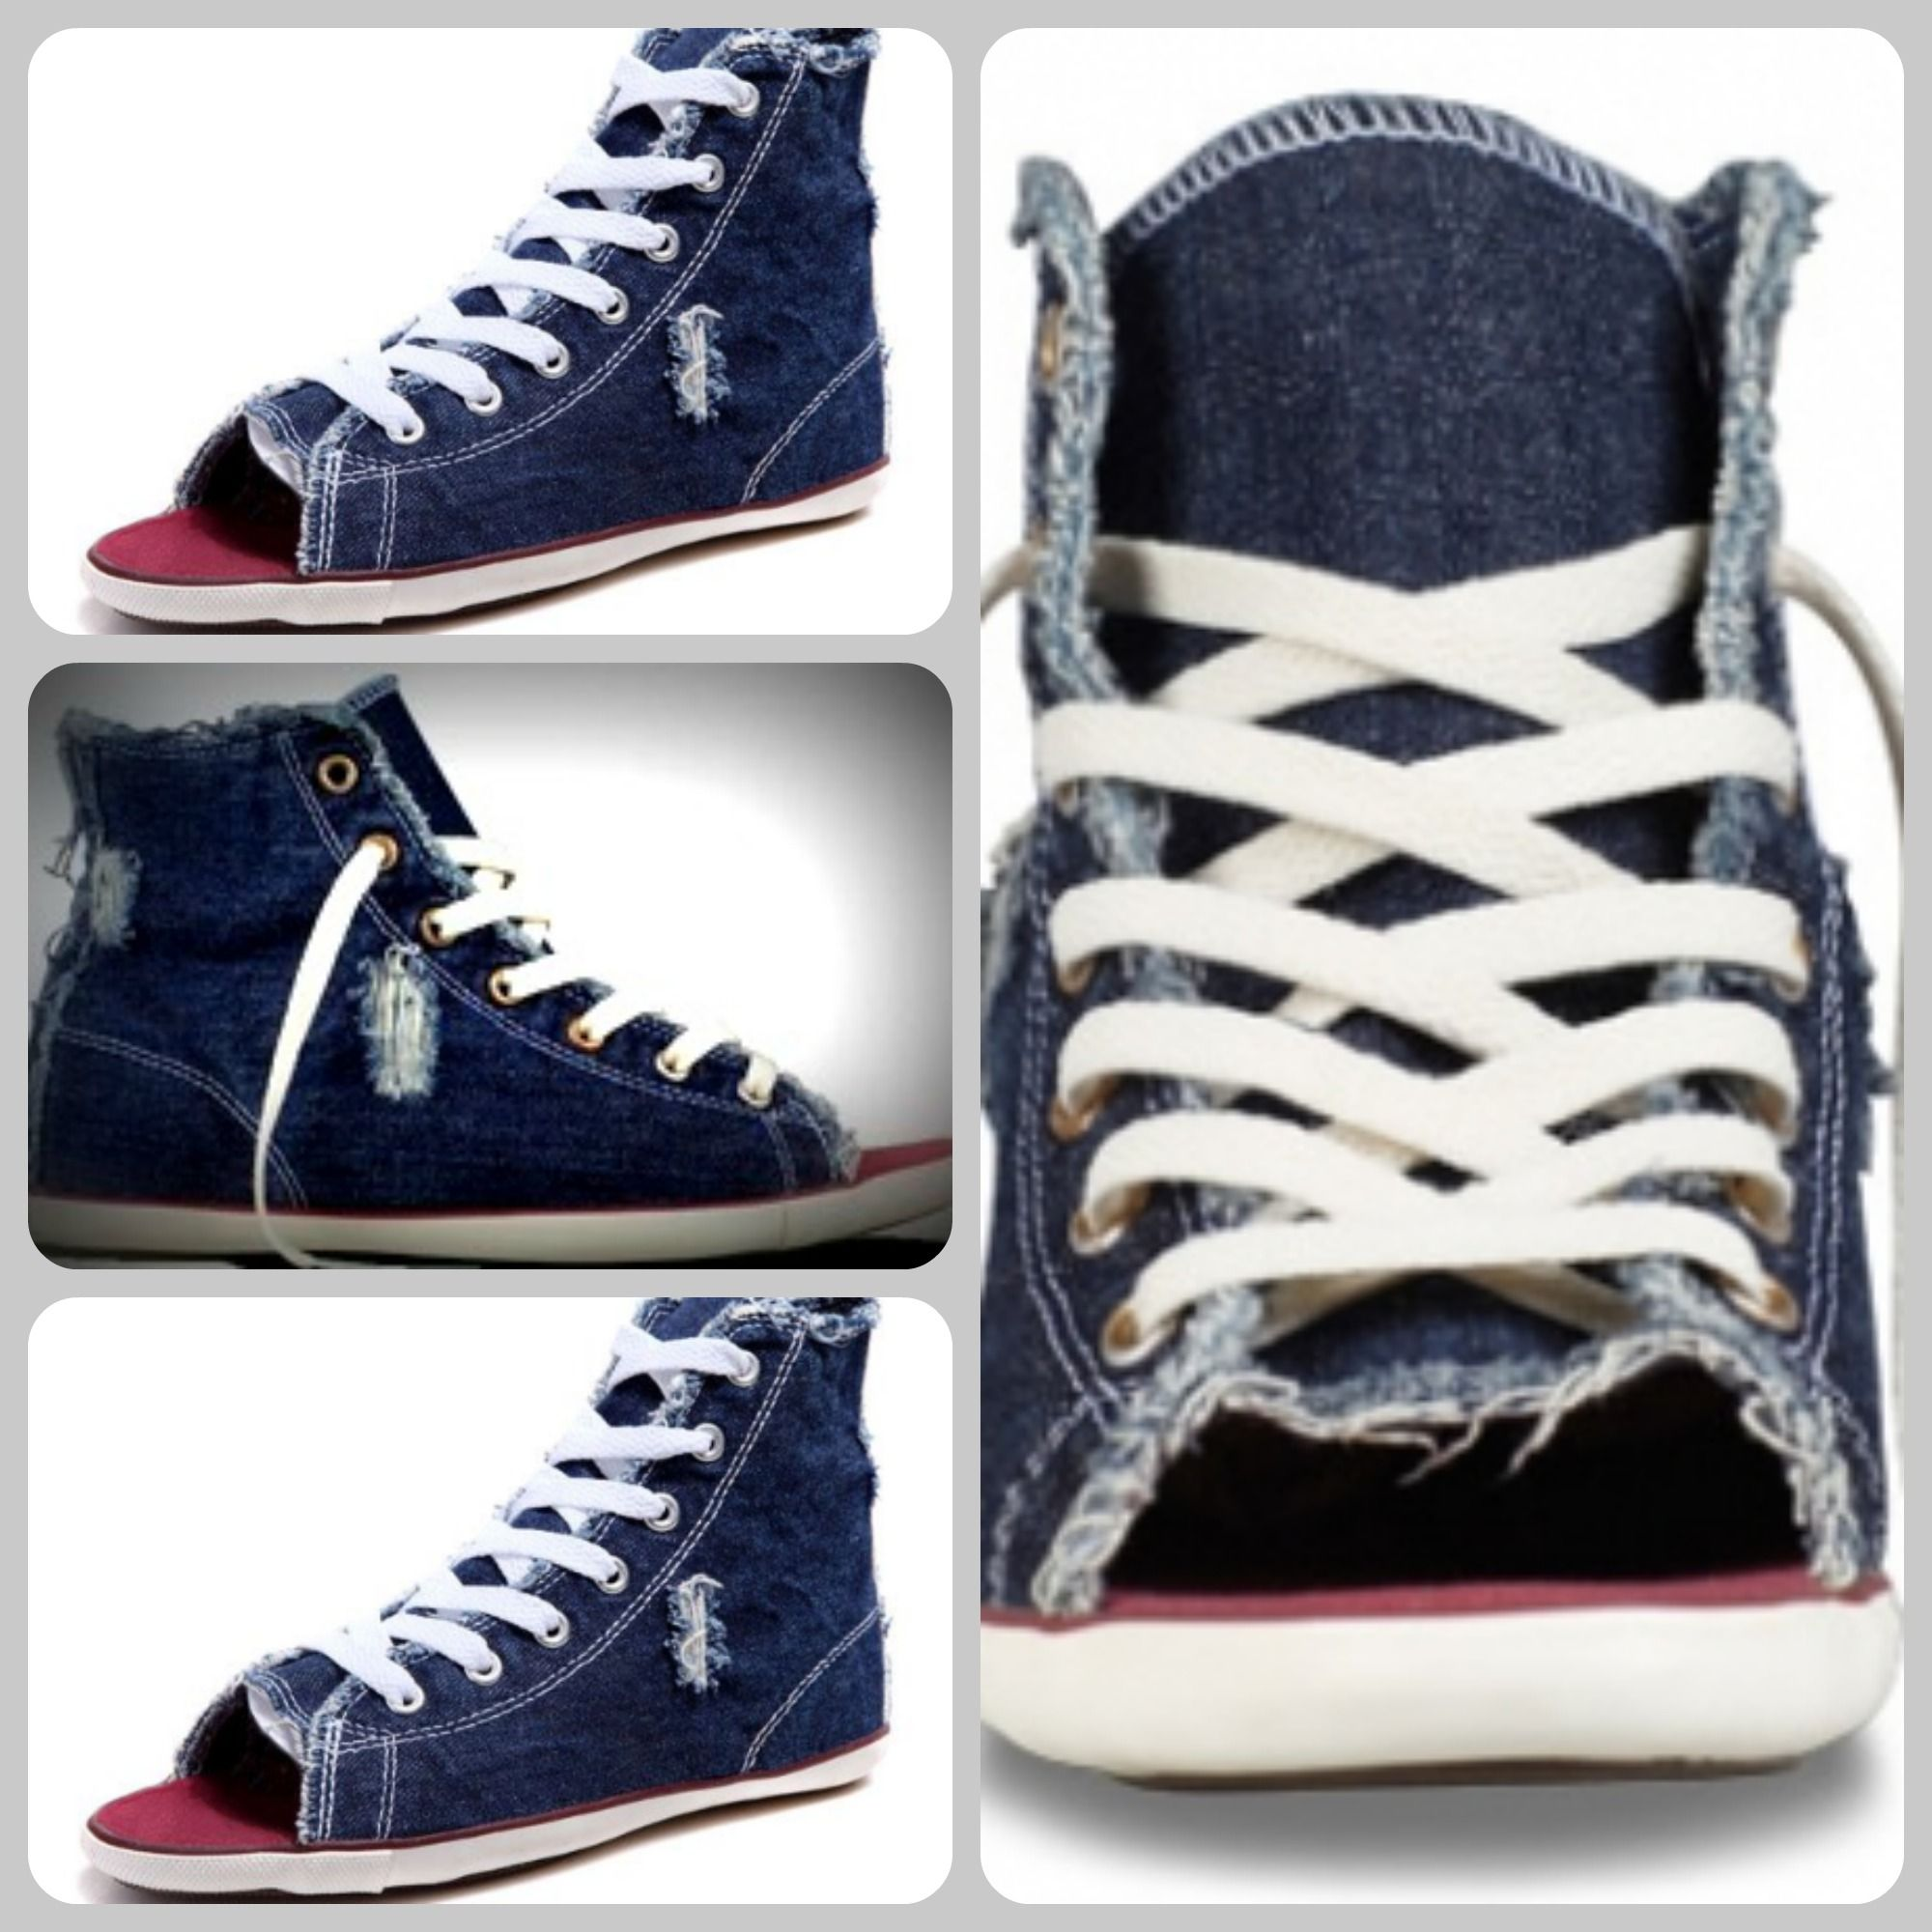 converse open toe sneakers